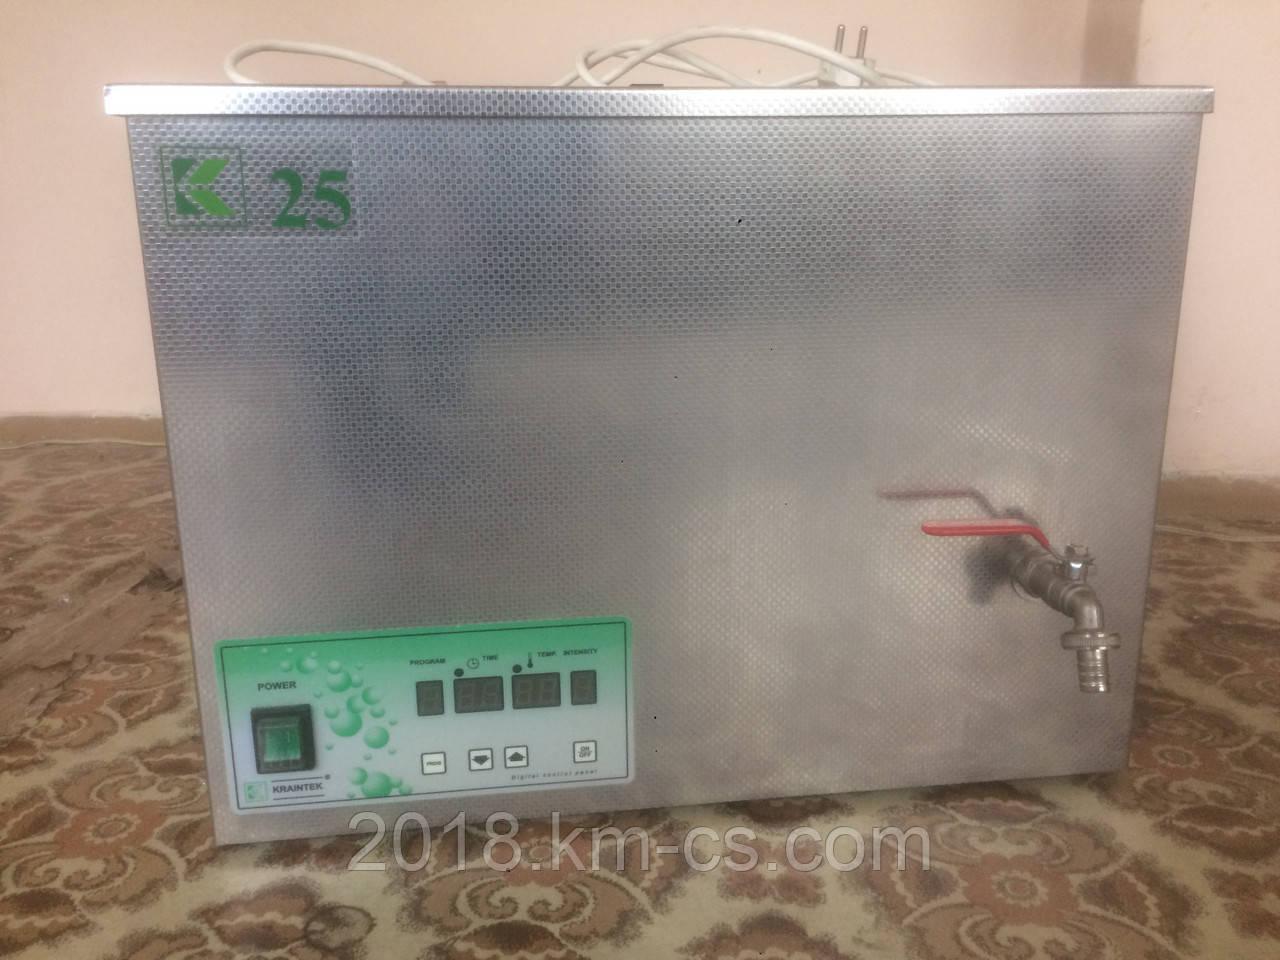 Ультразвуковая ванна с электронным управлением Kraintek K-25E (25 л), фото 1